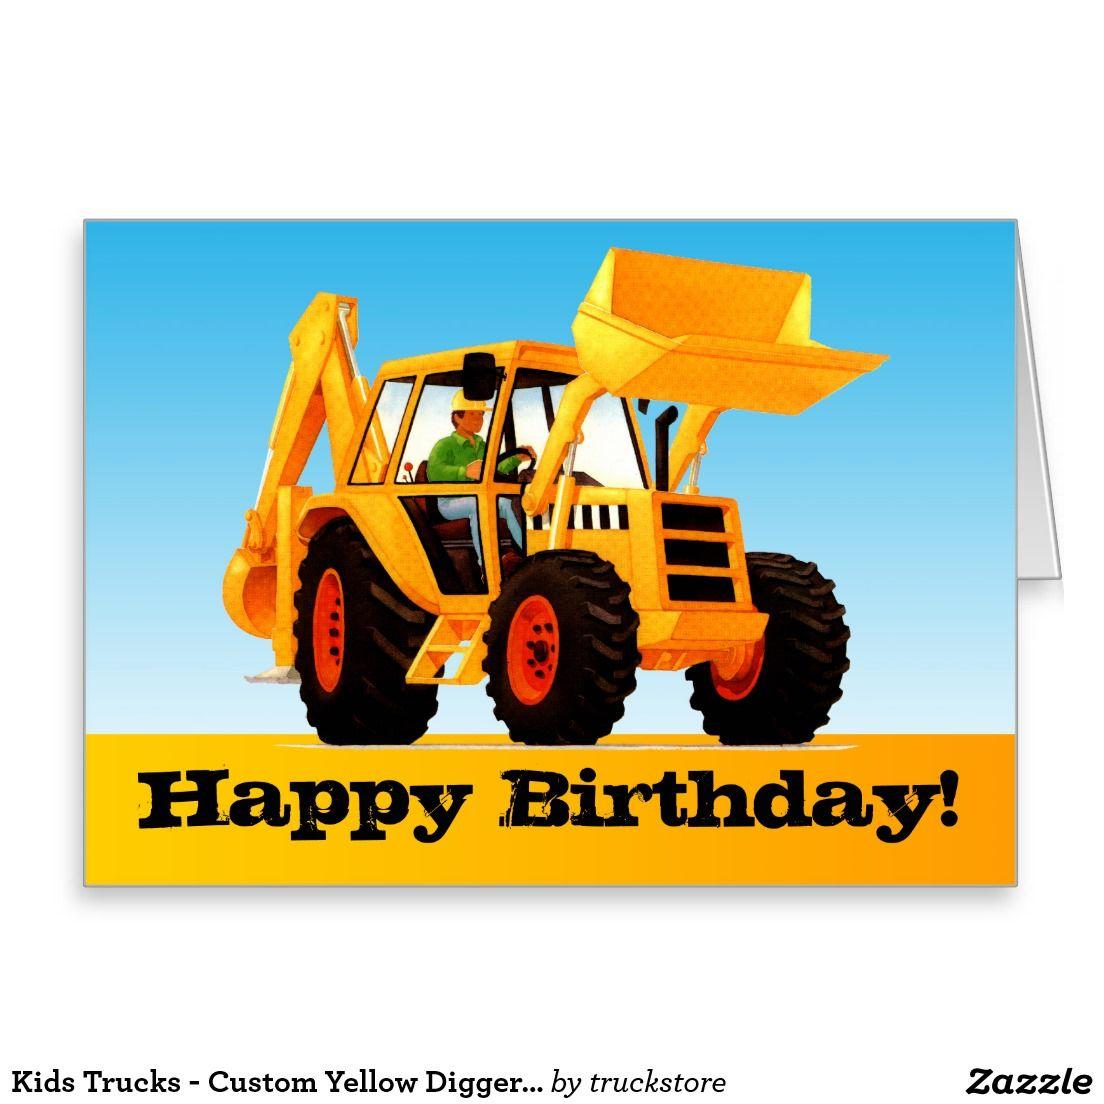 Kids Trucks Custom Yellow Digger Happy Birthday Card Zazzle Com In 2021 Happy Birthday Boy Happy Birthday Greeting Card Happy Birthday Cards